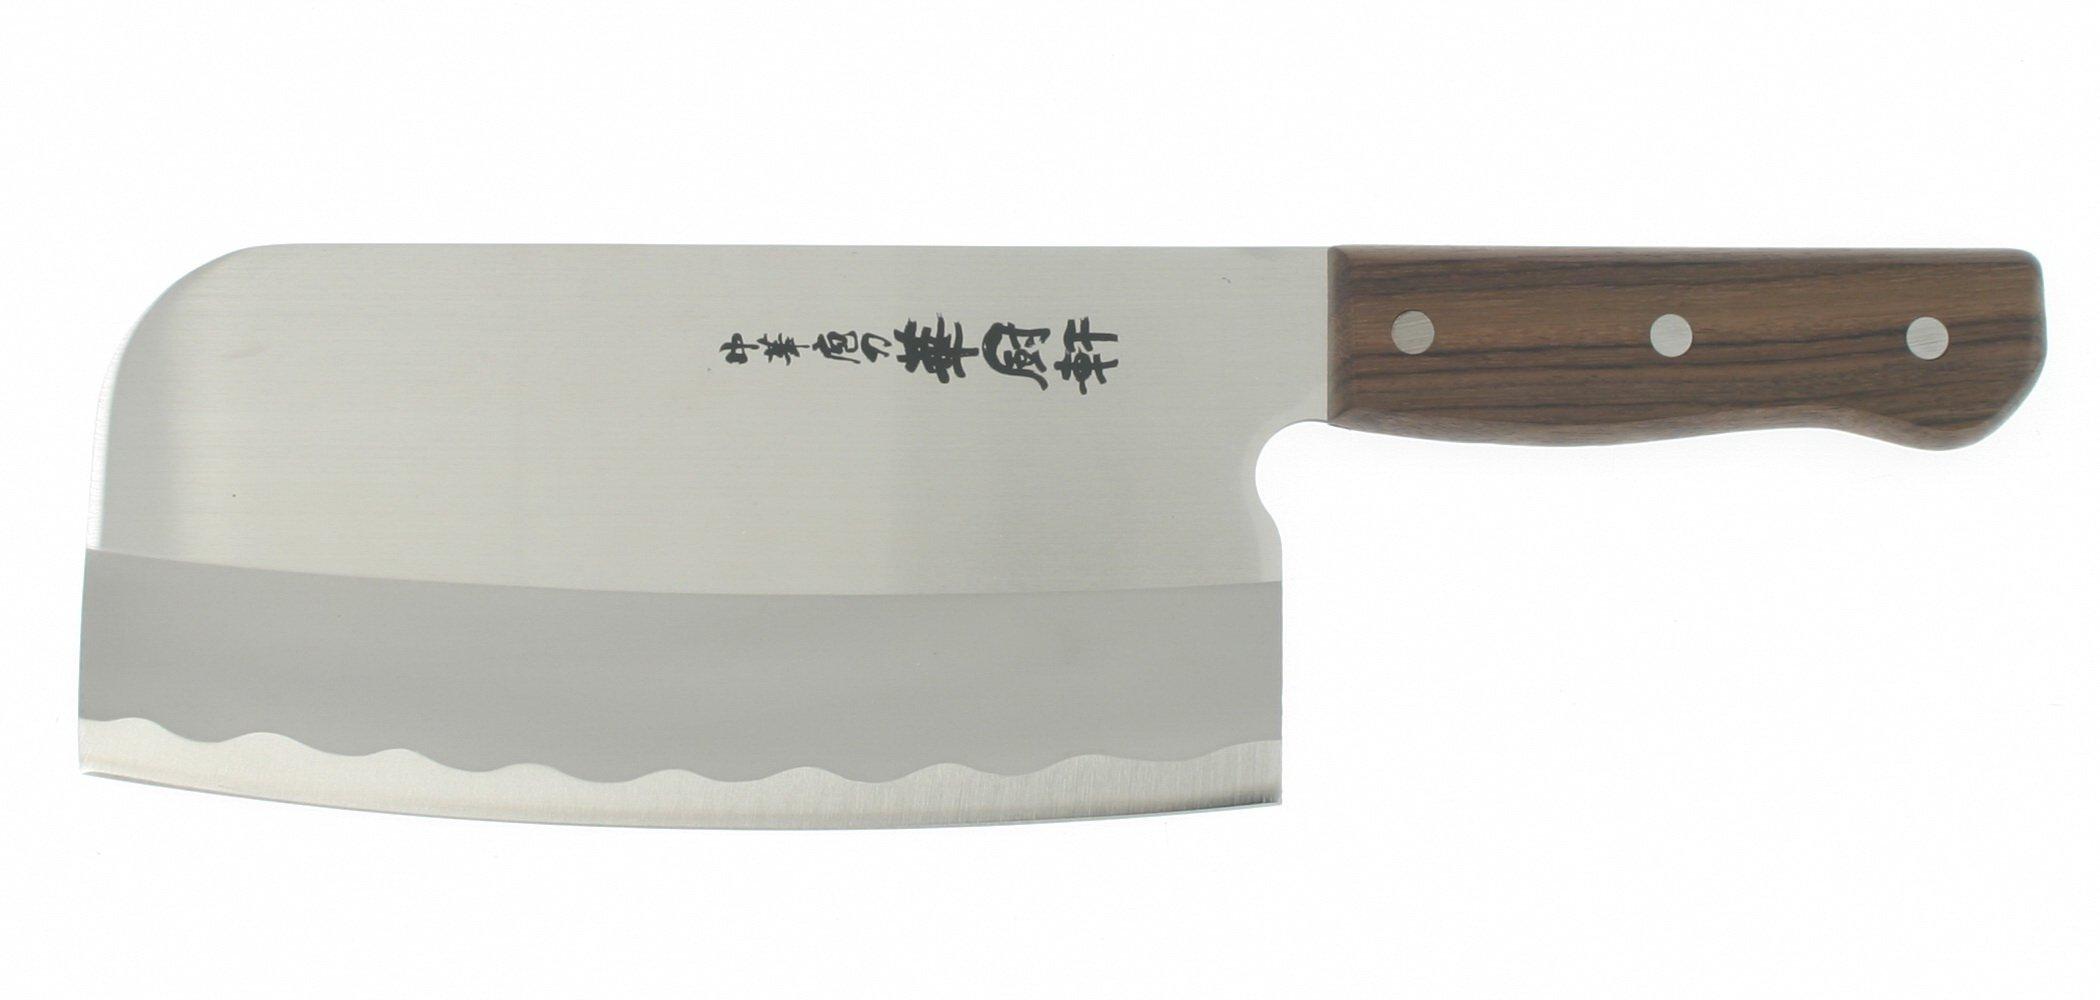 Kotobuki Midoru Kachuken 7-1/8-Inch Large Cleaver